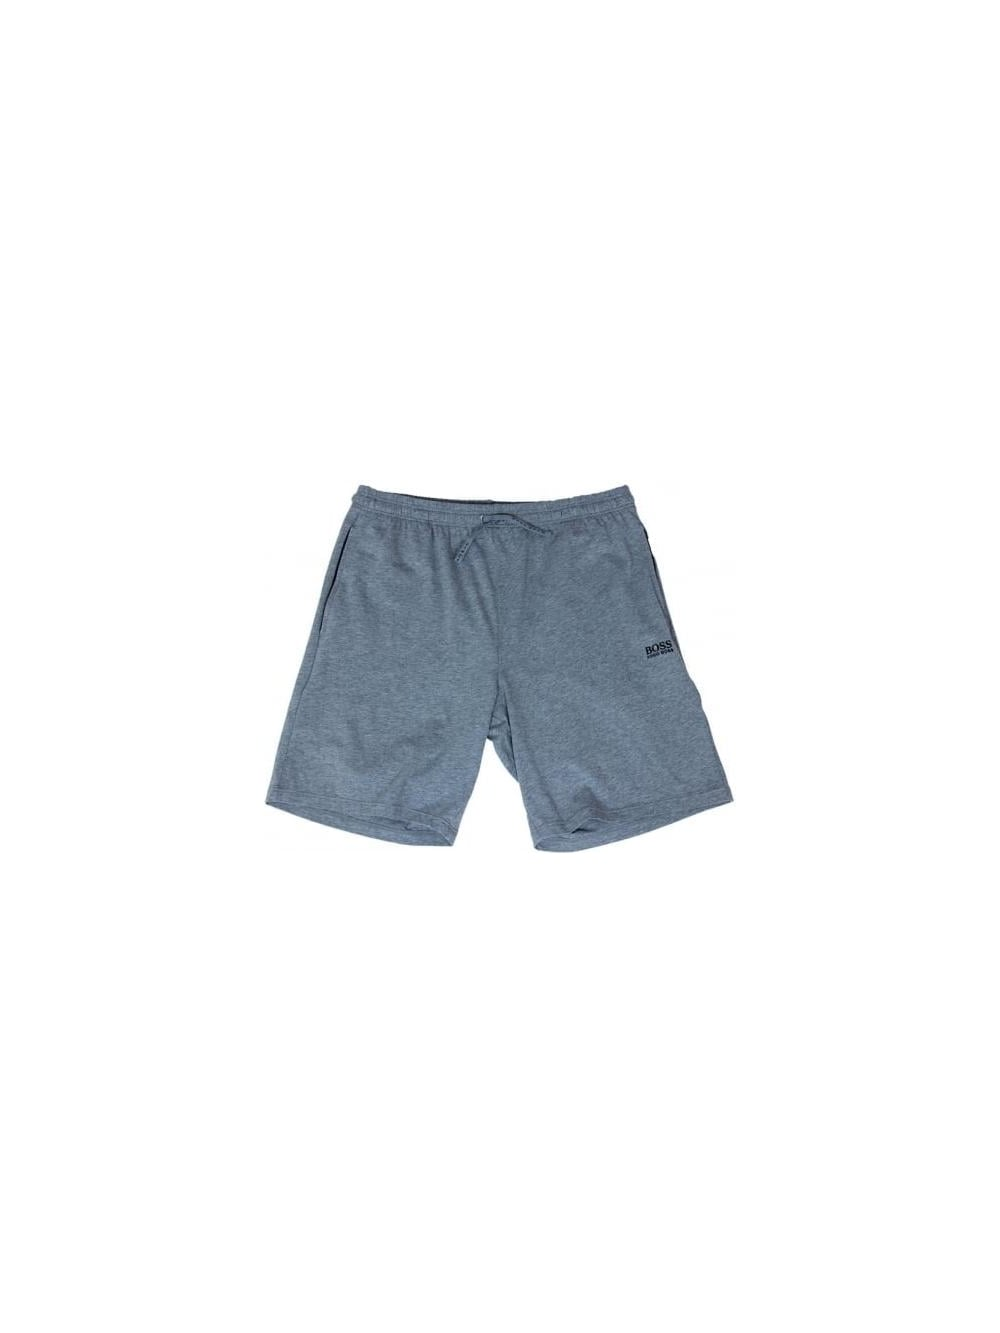 1d49f1619 HUGO BOSS - BOSS Hugo Boss Logo Sweat Shorts - Northern Threads